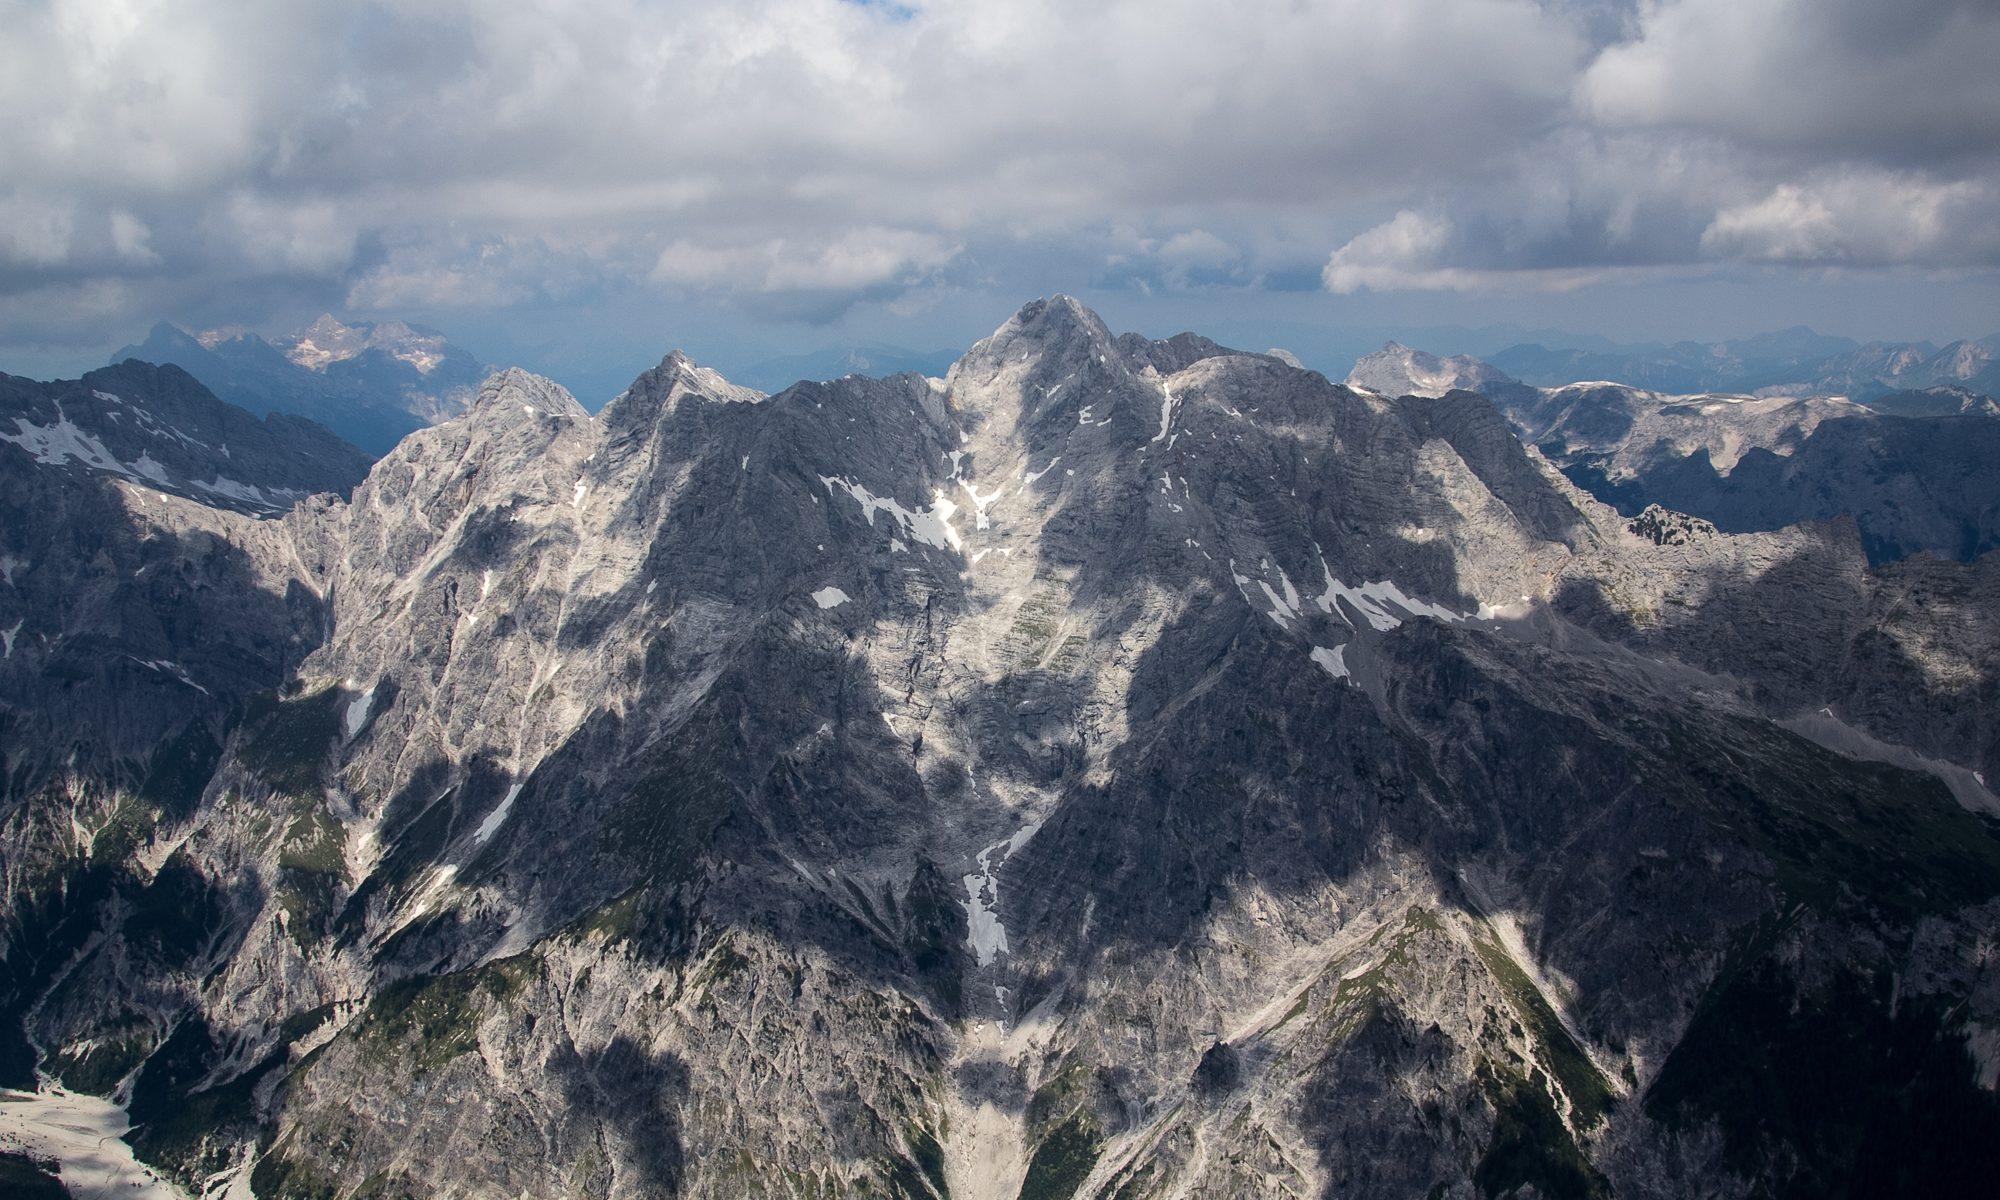 Dramatic sky seen from the Watzmann ridge in the Bavarian Alps